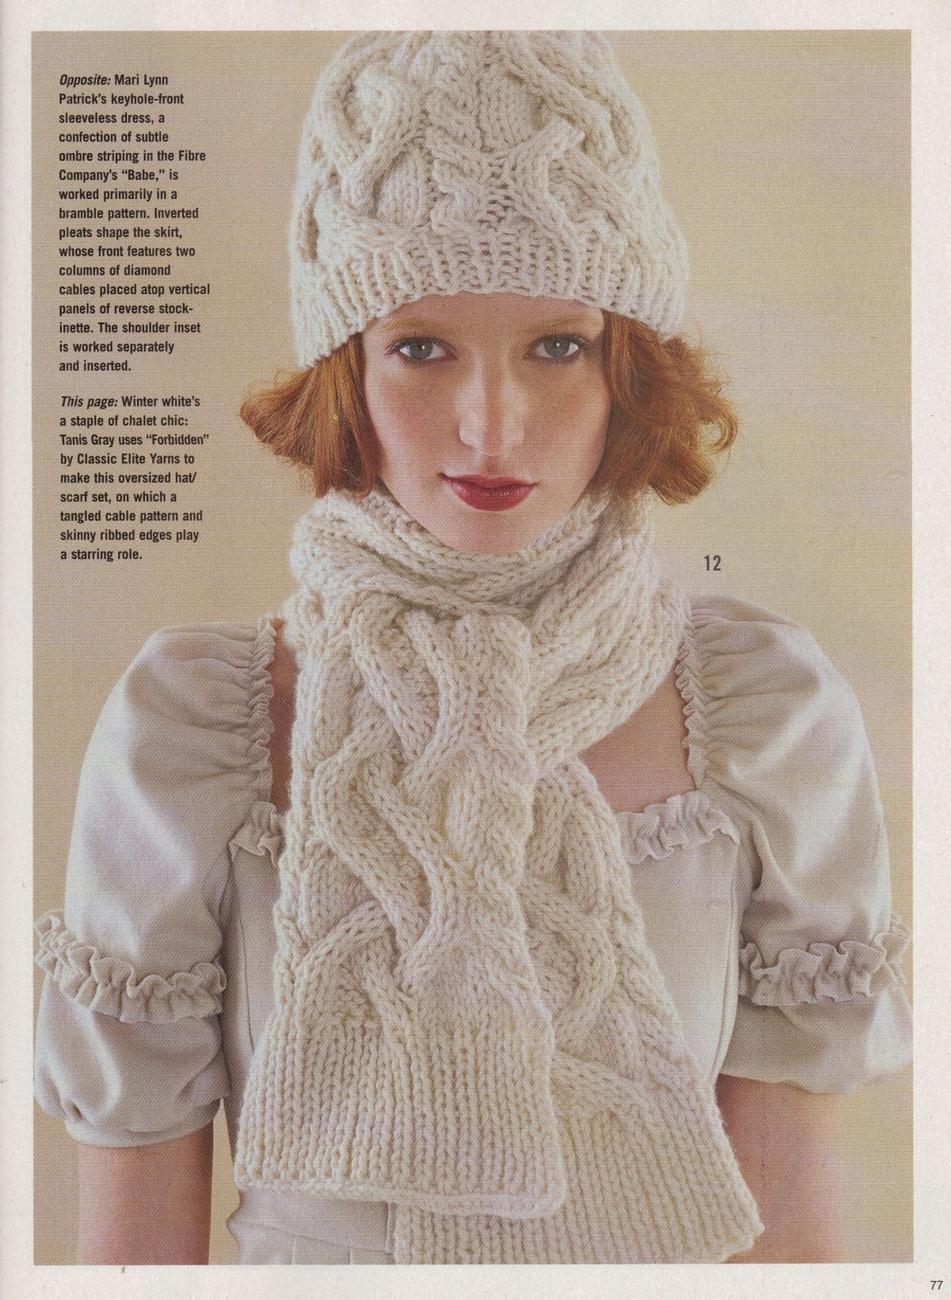 VOGUE KNITTING Winter 2007-08 Lace Shawl Aran Cable Swing Coat Cardigan Jacke...